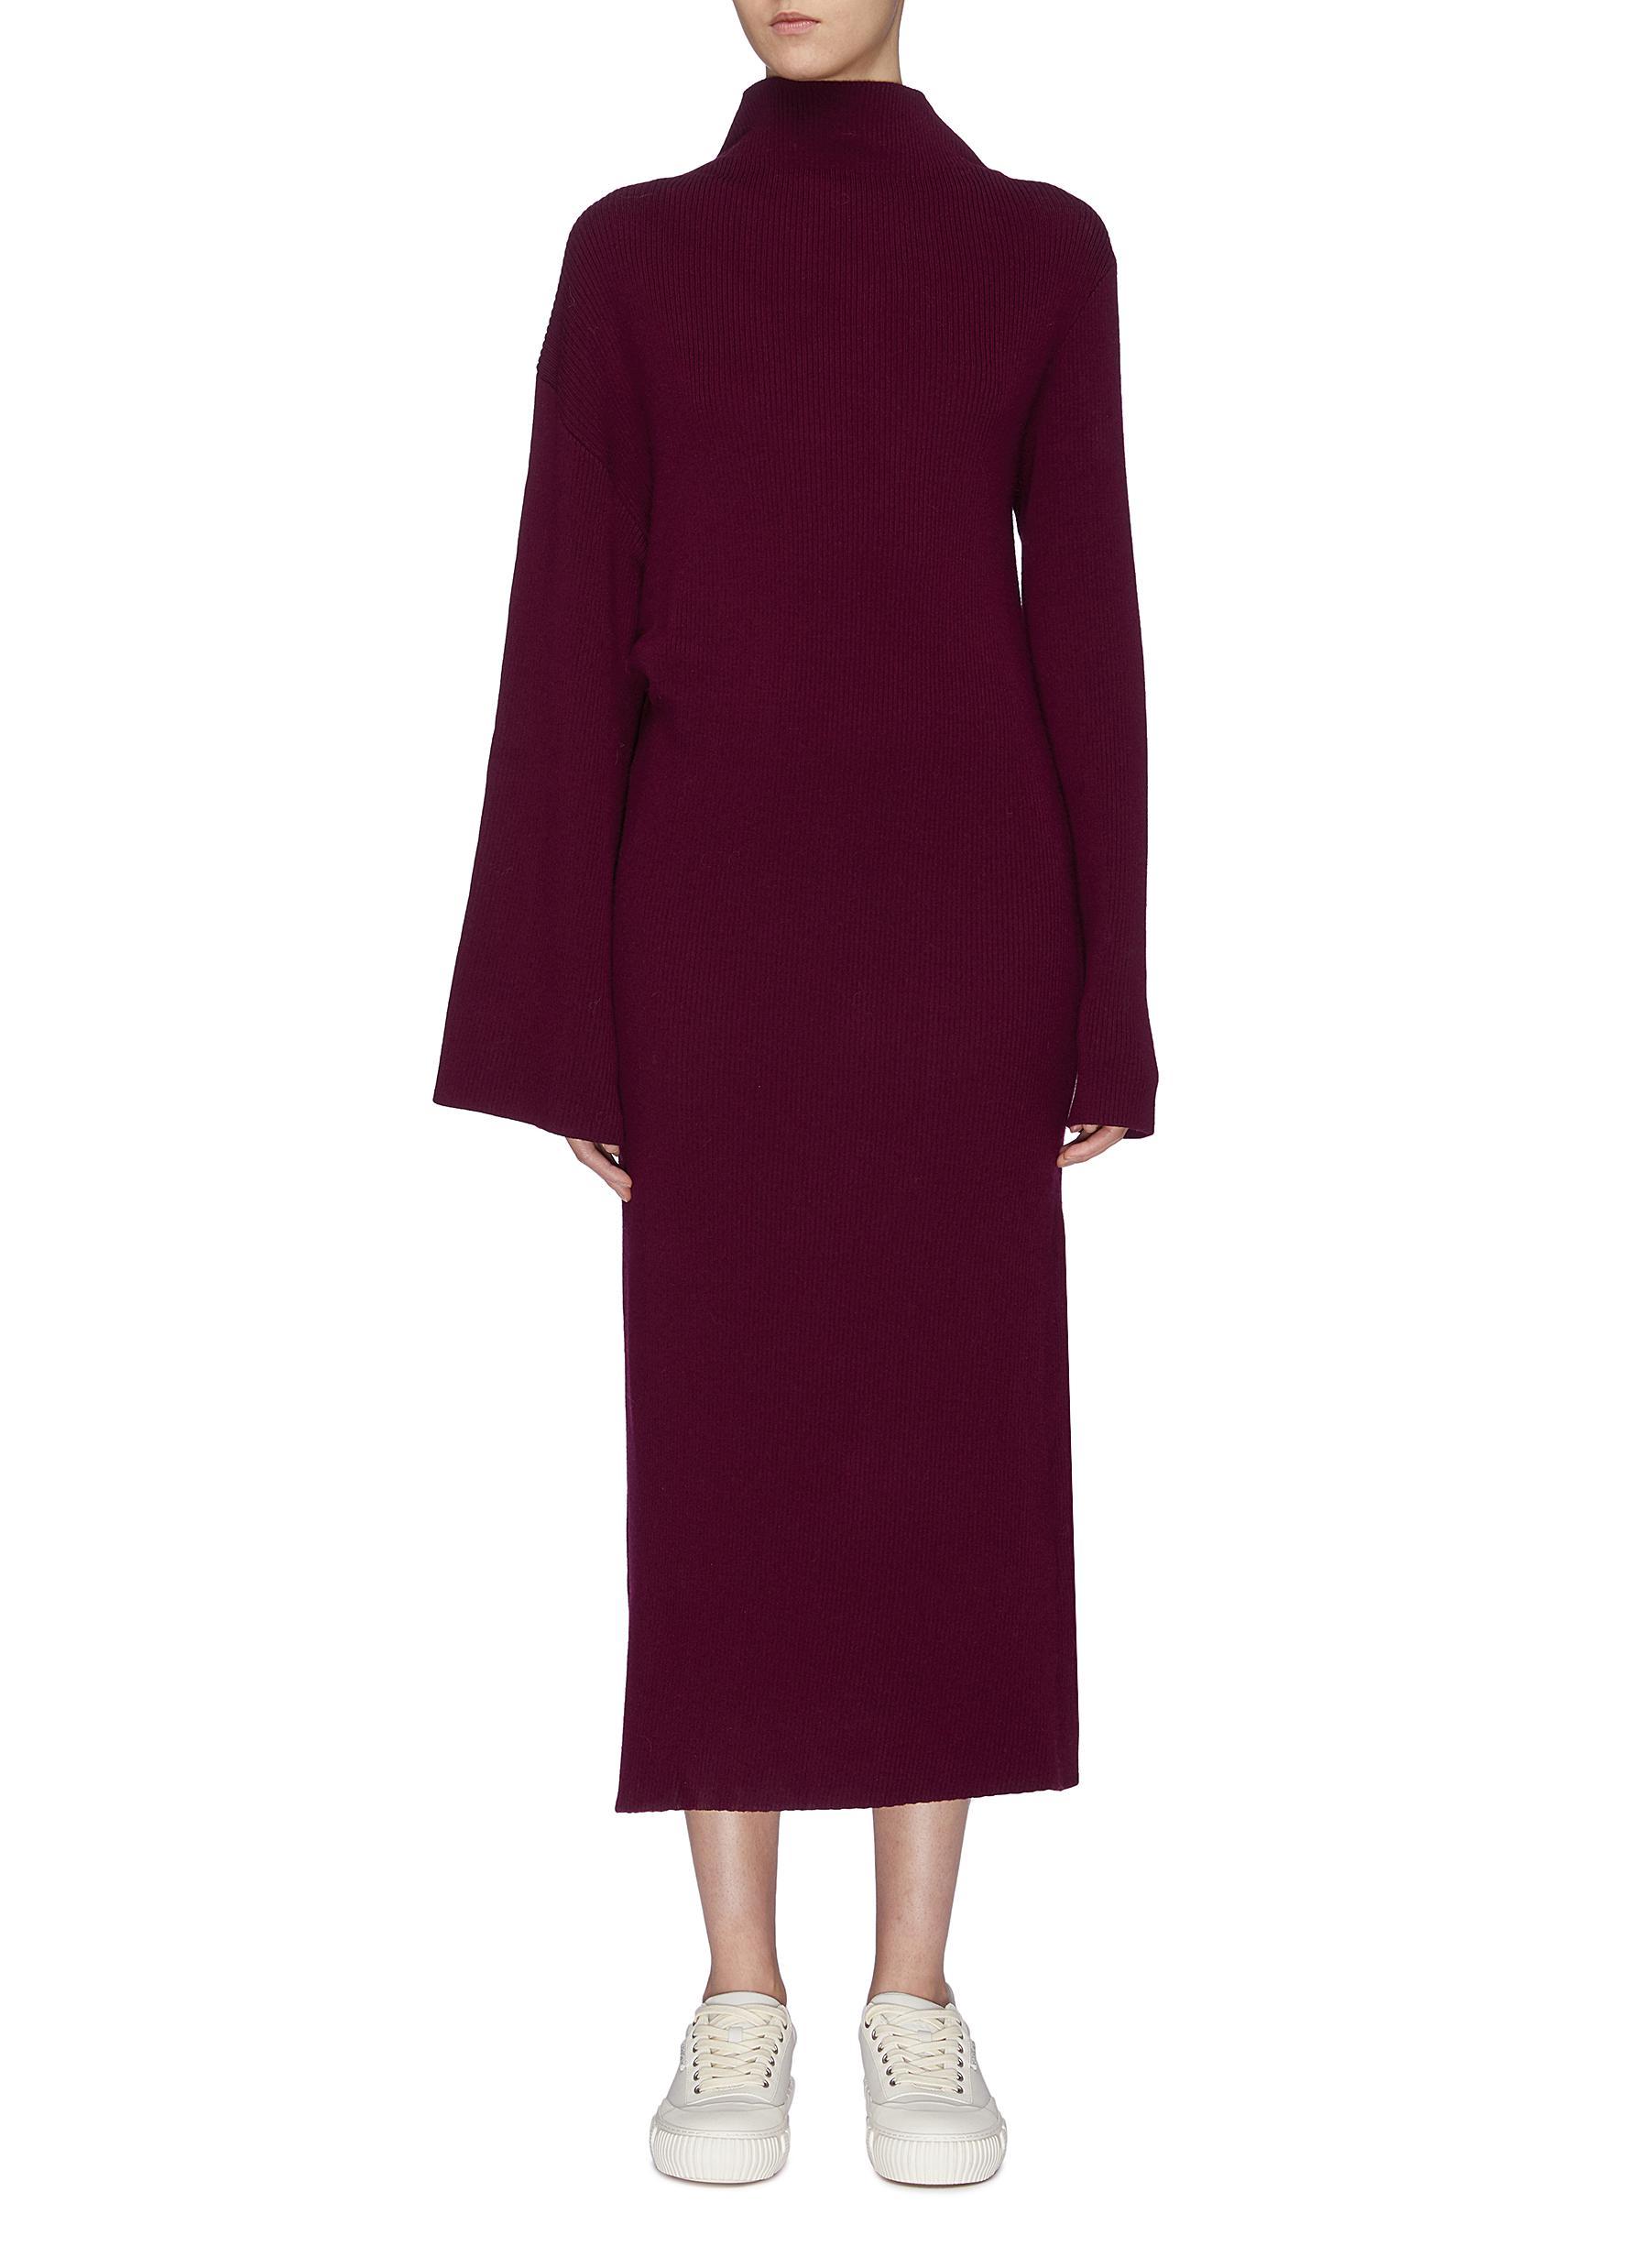 Asymmetric sleeve wool rib knit turtleneck dress by Ffixxed Studios